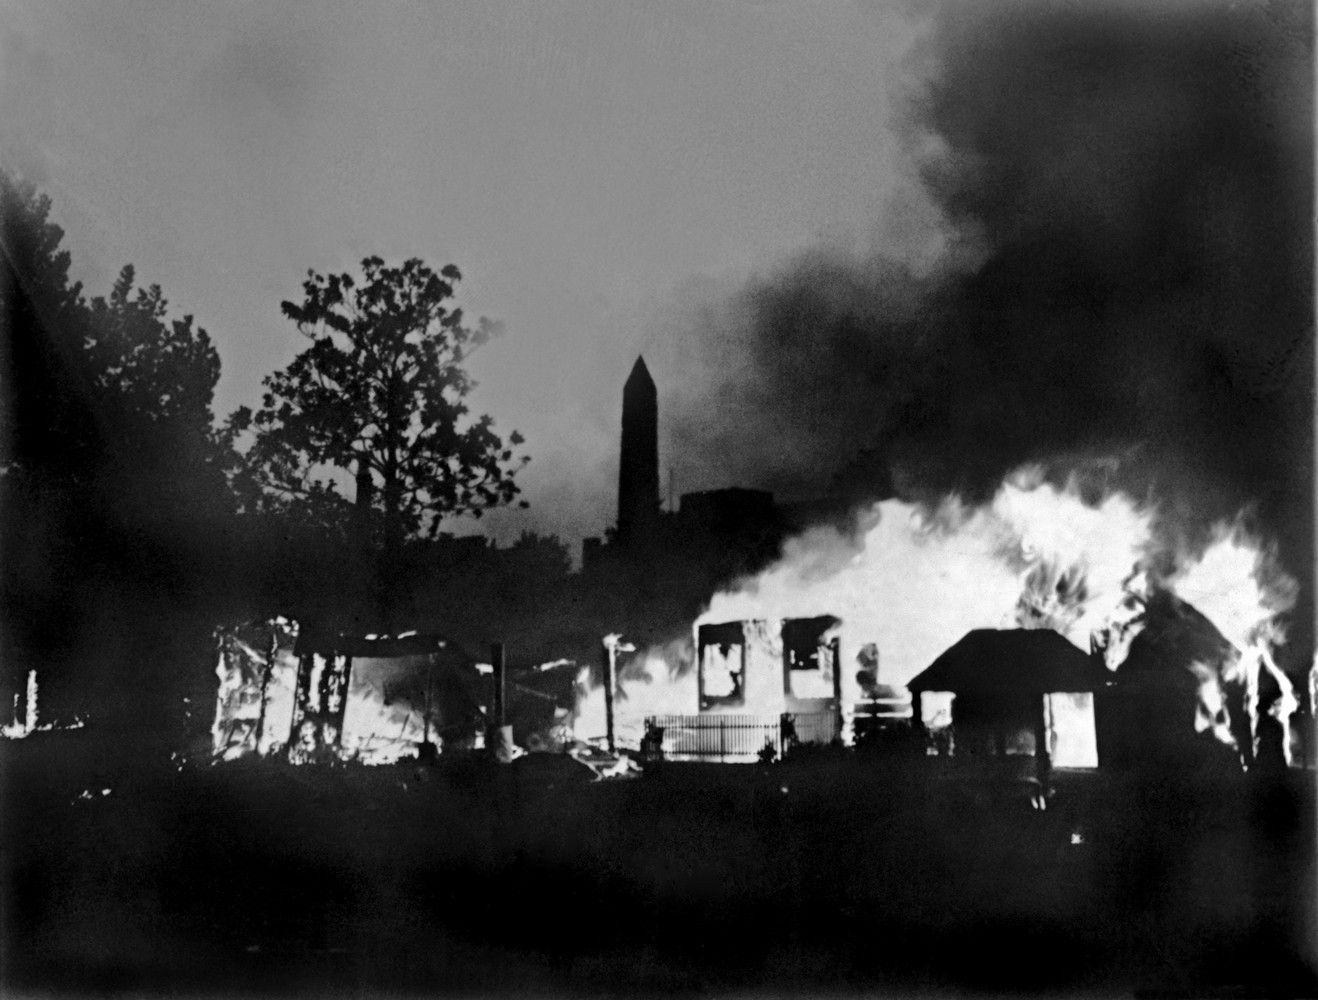 A Bonus Army veterans' encampment in Washington, D.C. being burned in 1932